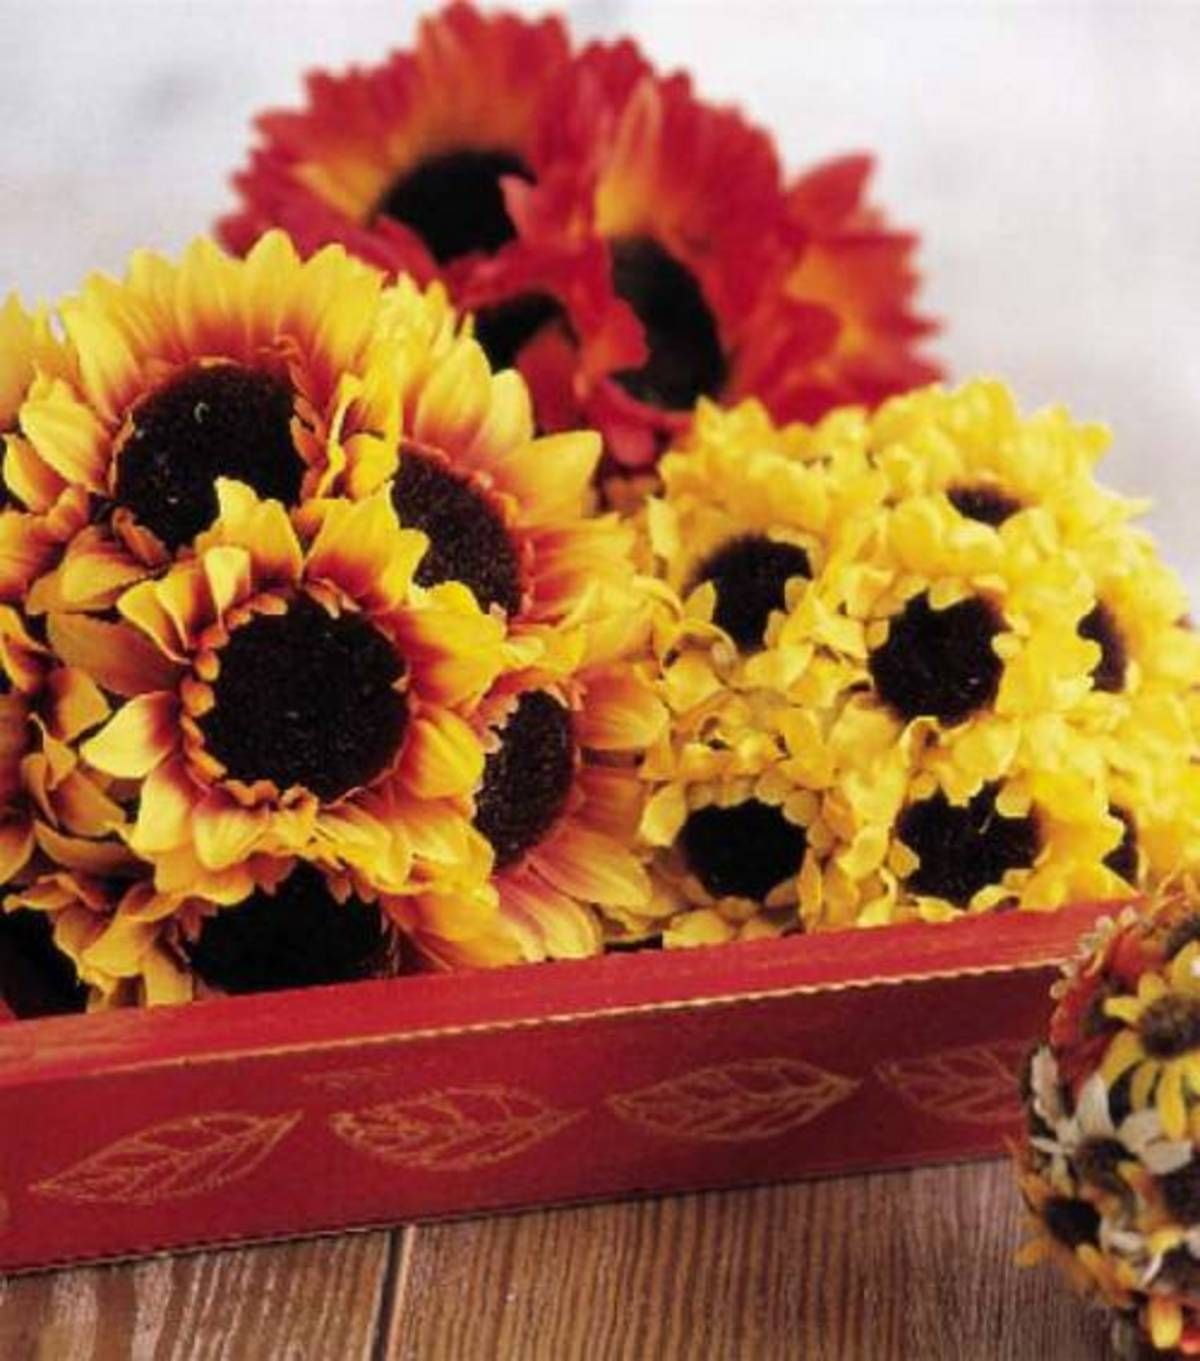 We love floral arrangements! #DIY these sunflower pomander balls | Find flowers and more at Joann.com